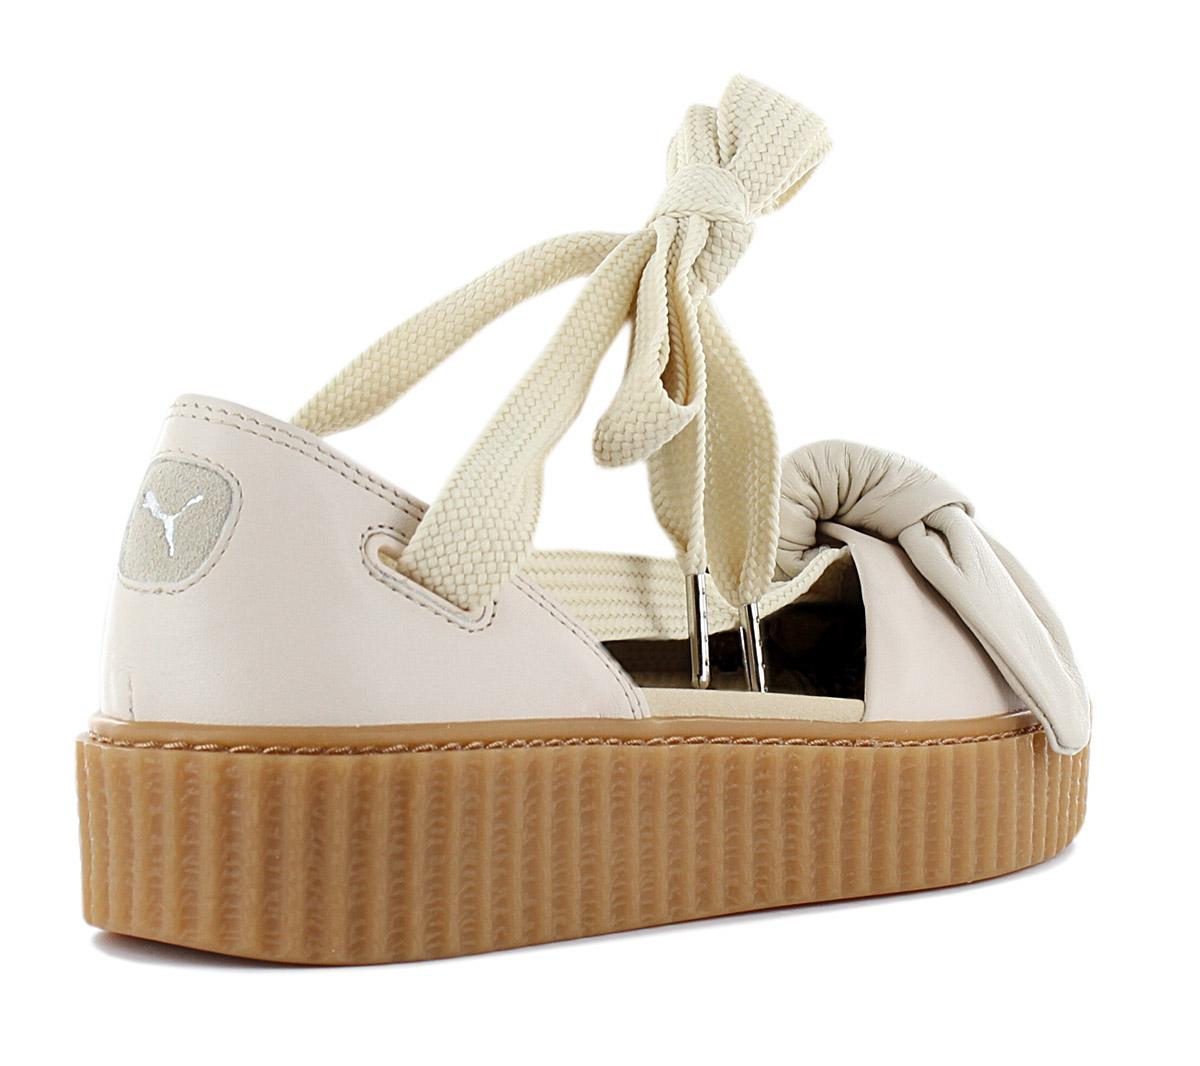 892f40d78b2d Fenty x Puma by Rihanna Creeper Bow Women s Sandals 365794-02 Shoes ...